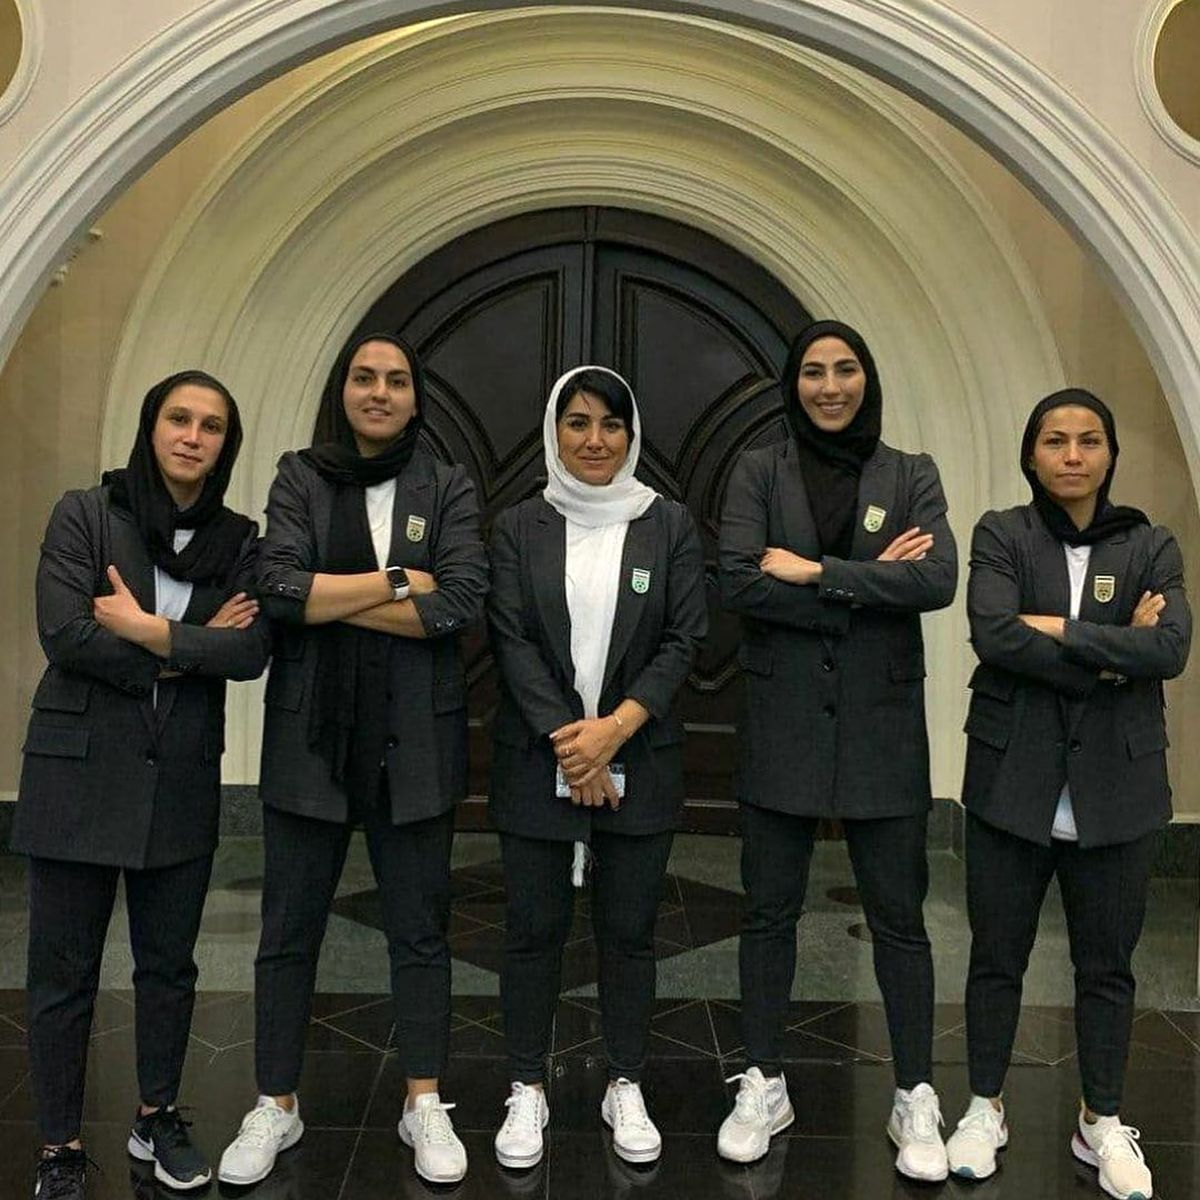 لباس تیم فوتبال بانوان جنجال به پا کرد + تصاویر